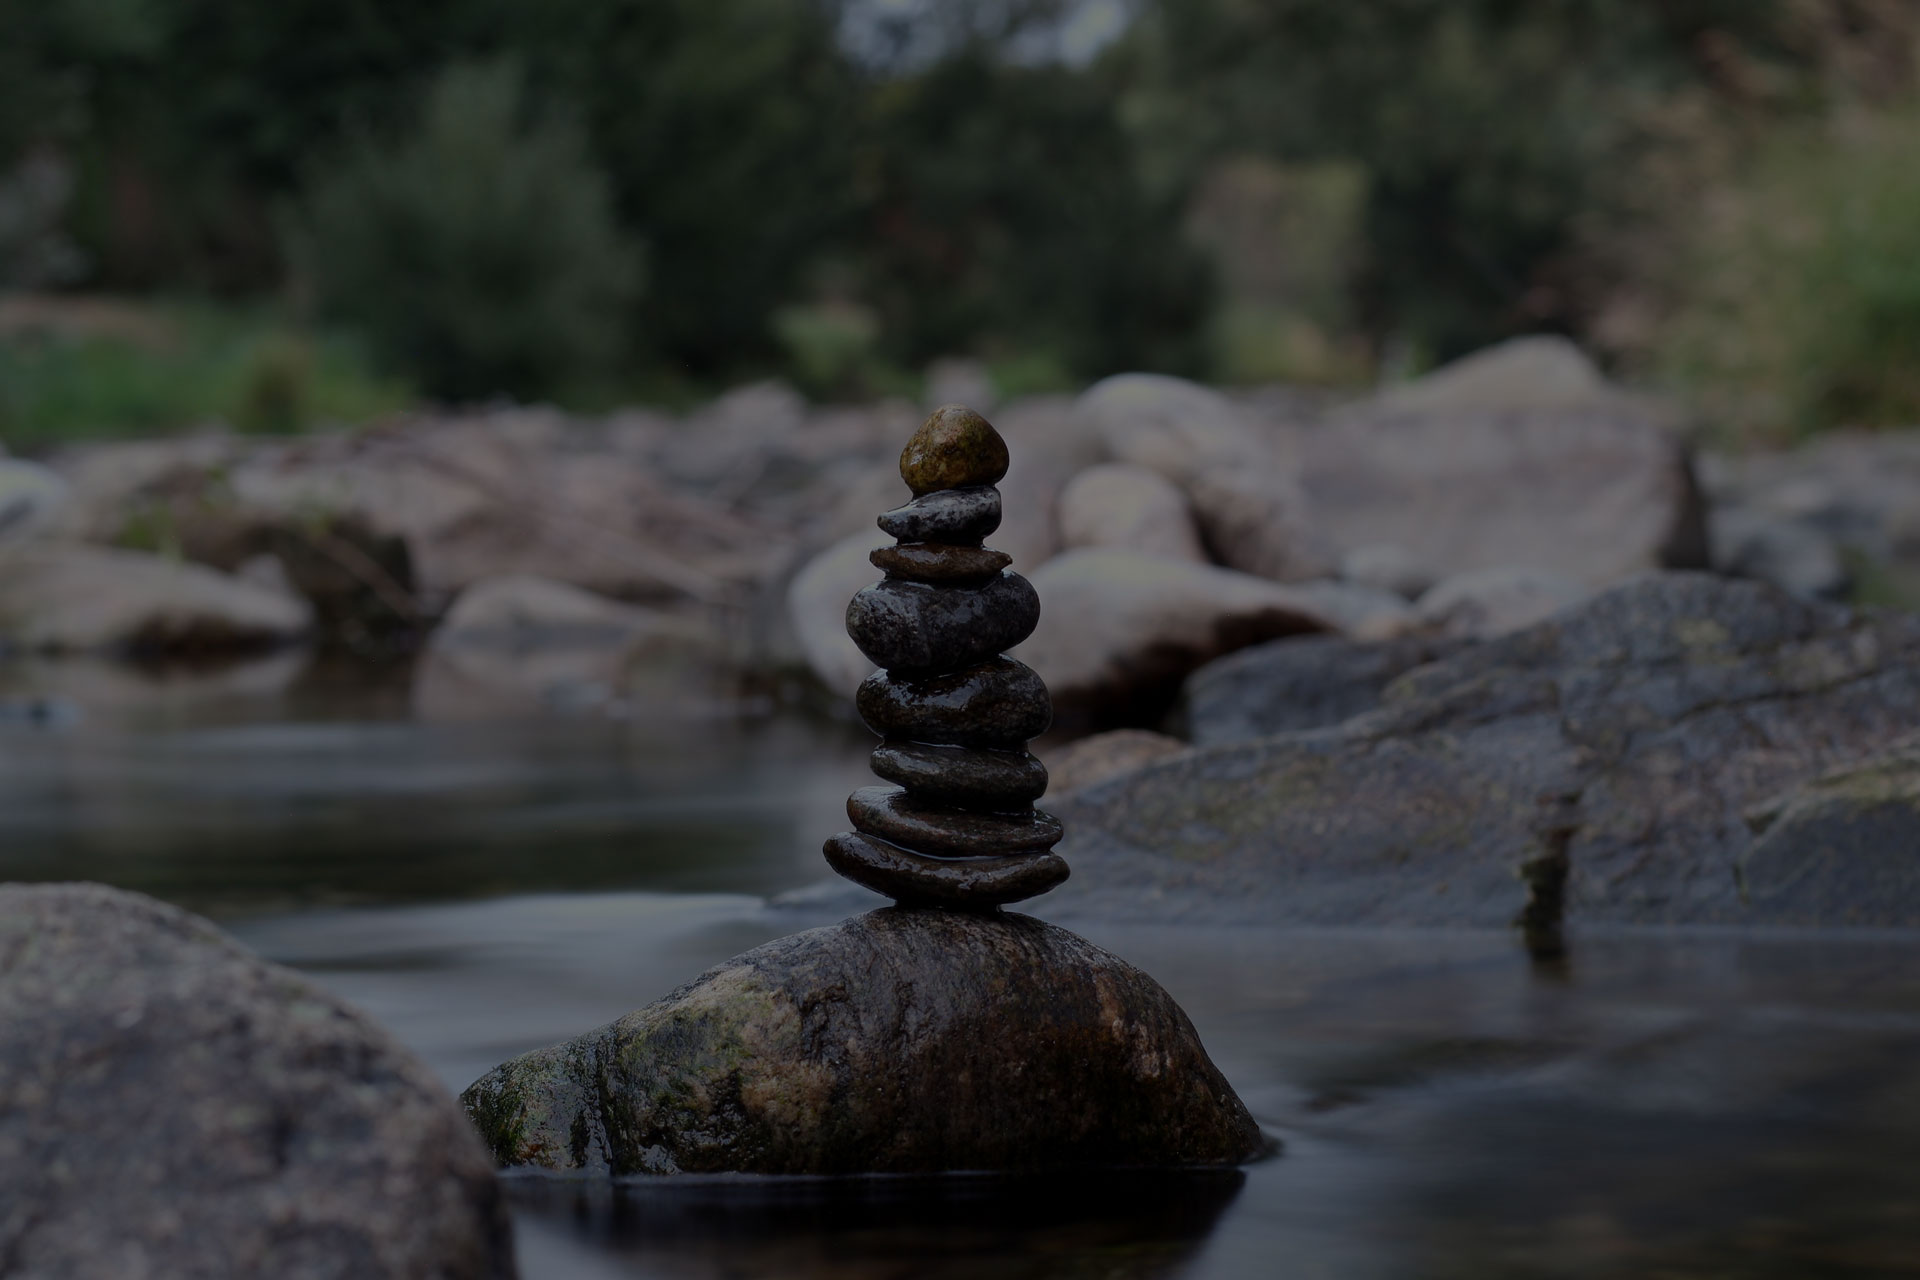 stone balance at the river